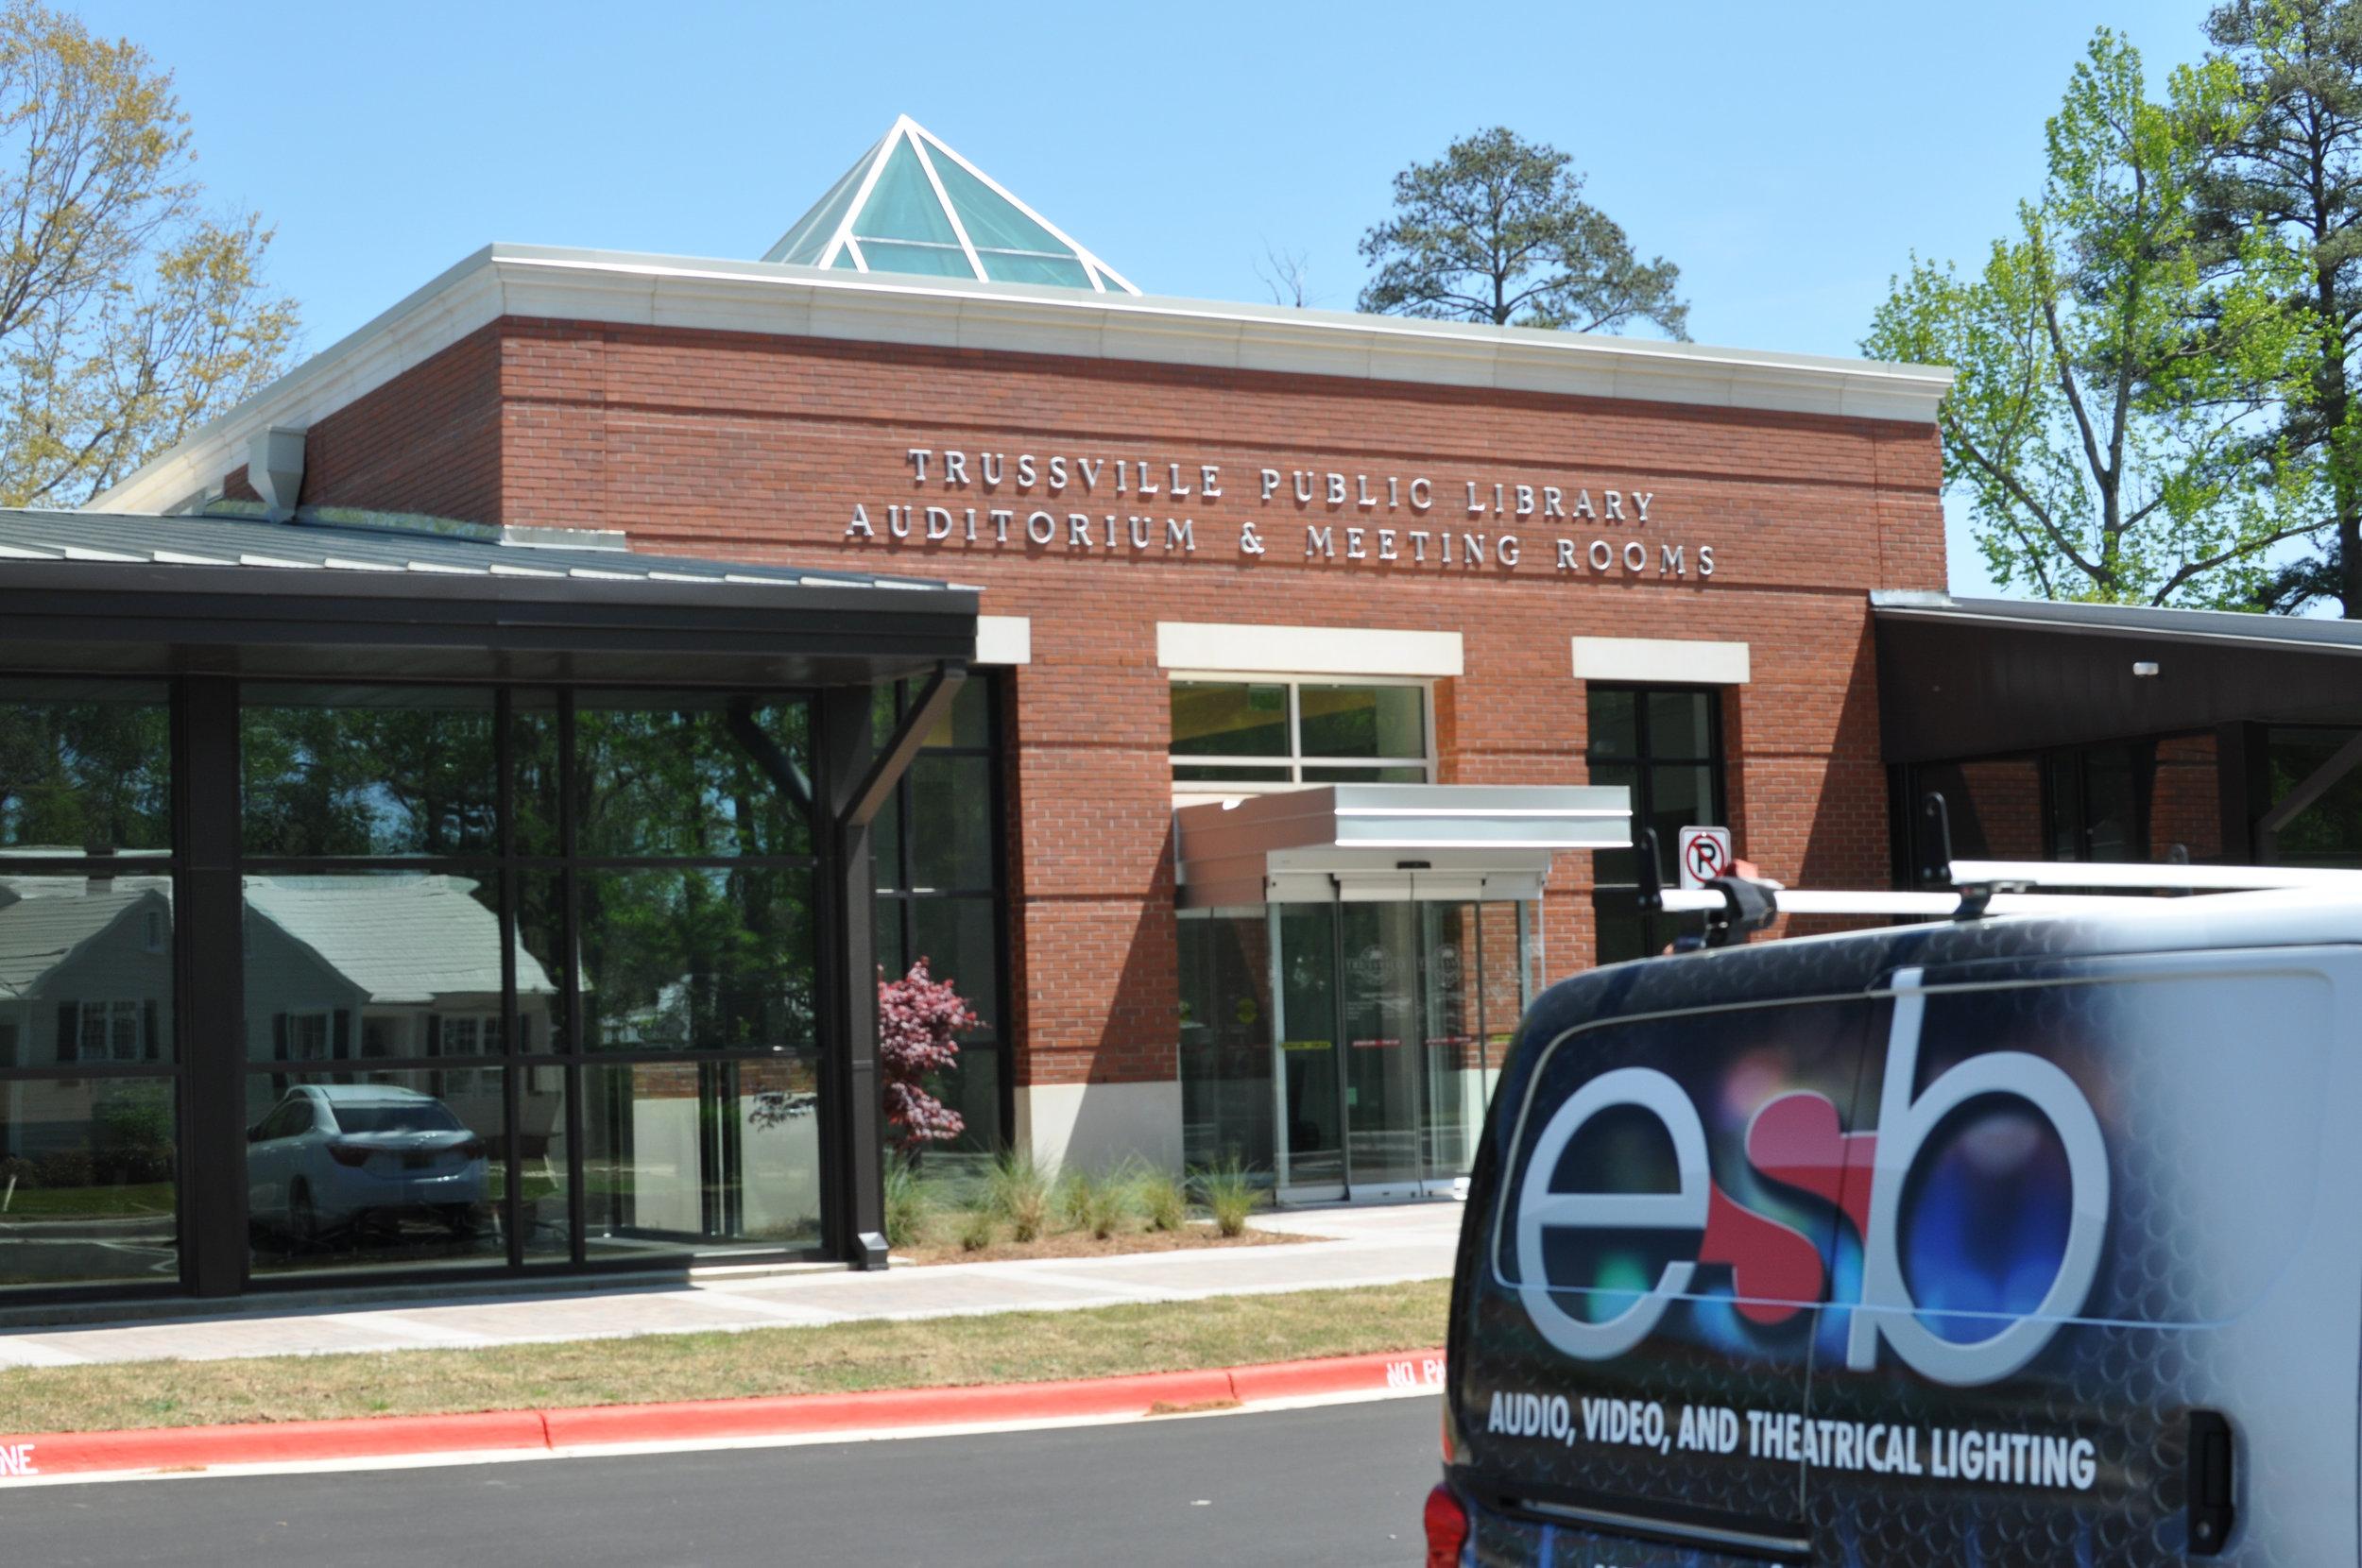 Trussville Public Library - Trussville, AL